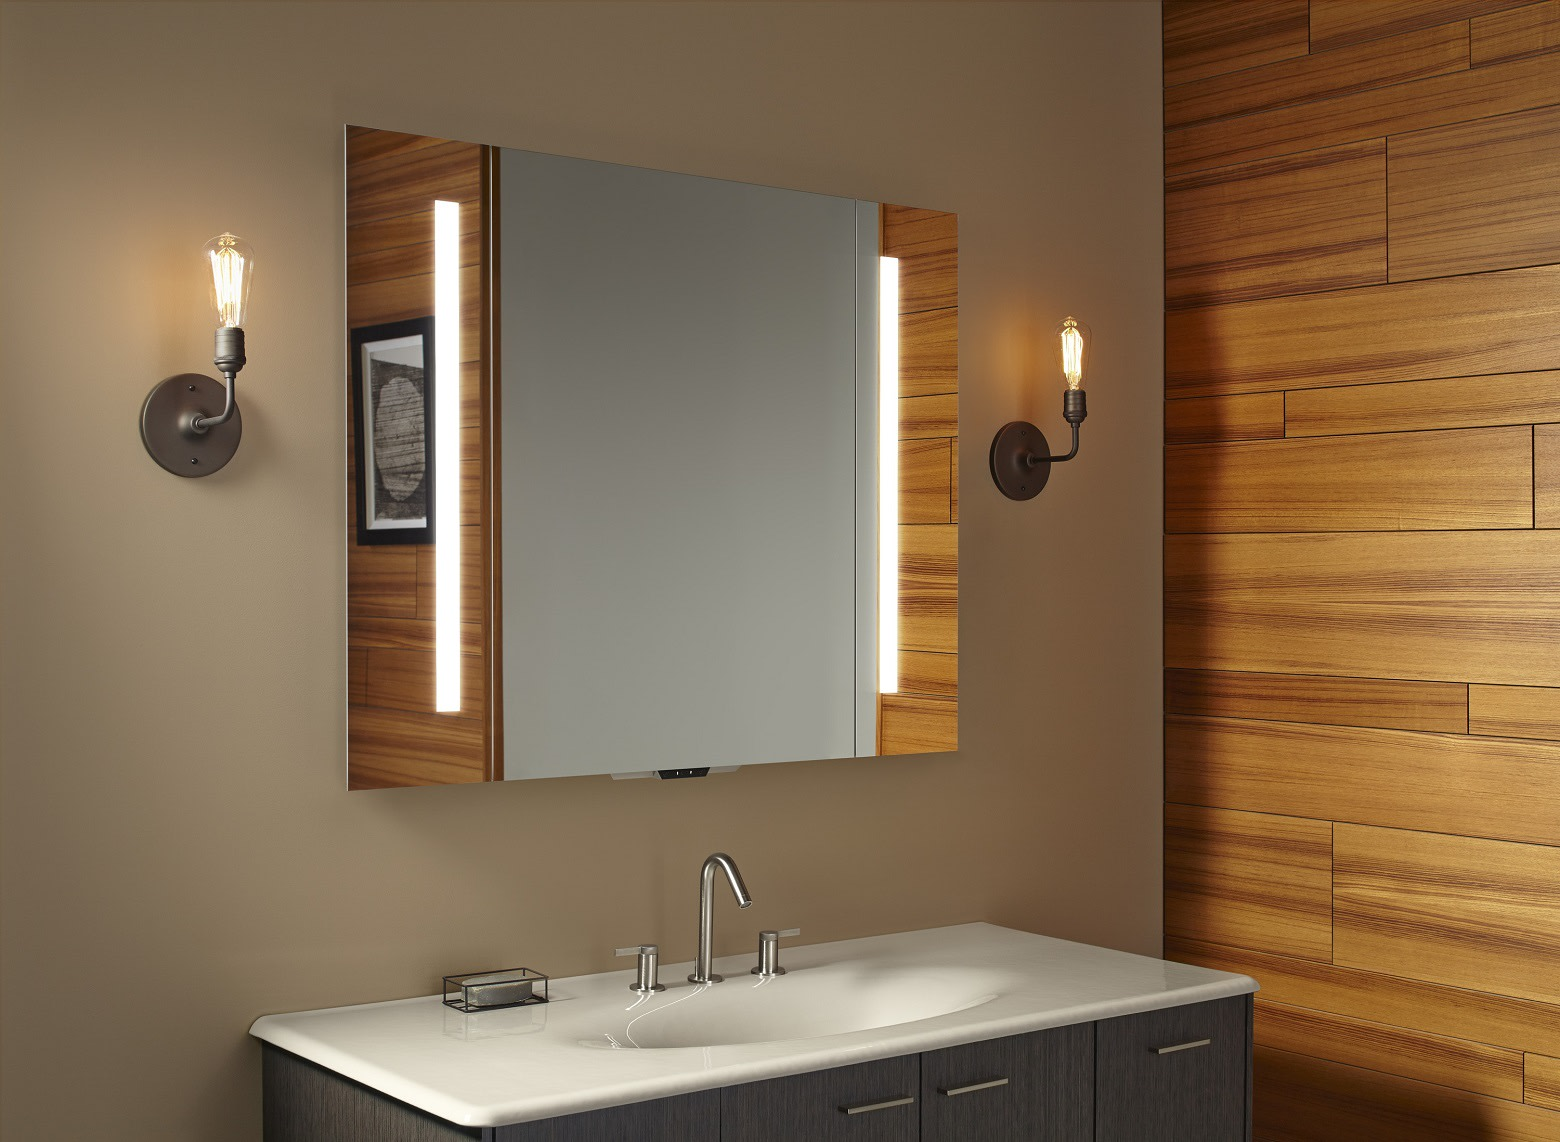 Kohler\'s new smart fixtures make Alexa your bathroom buddy